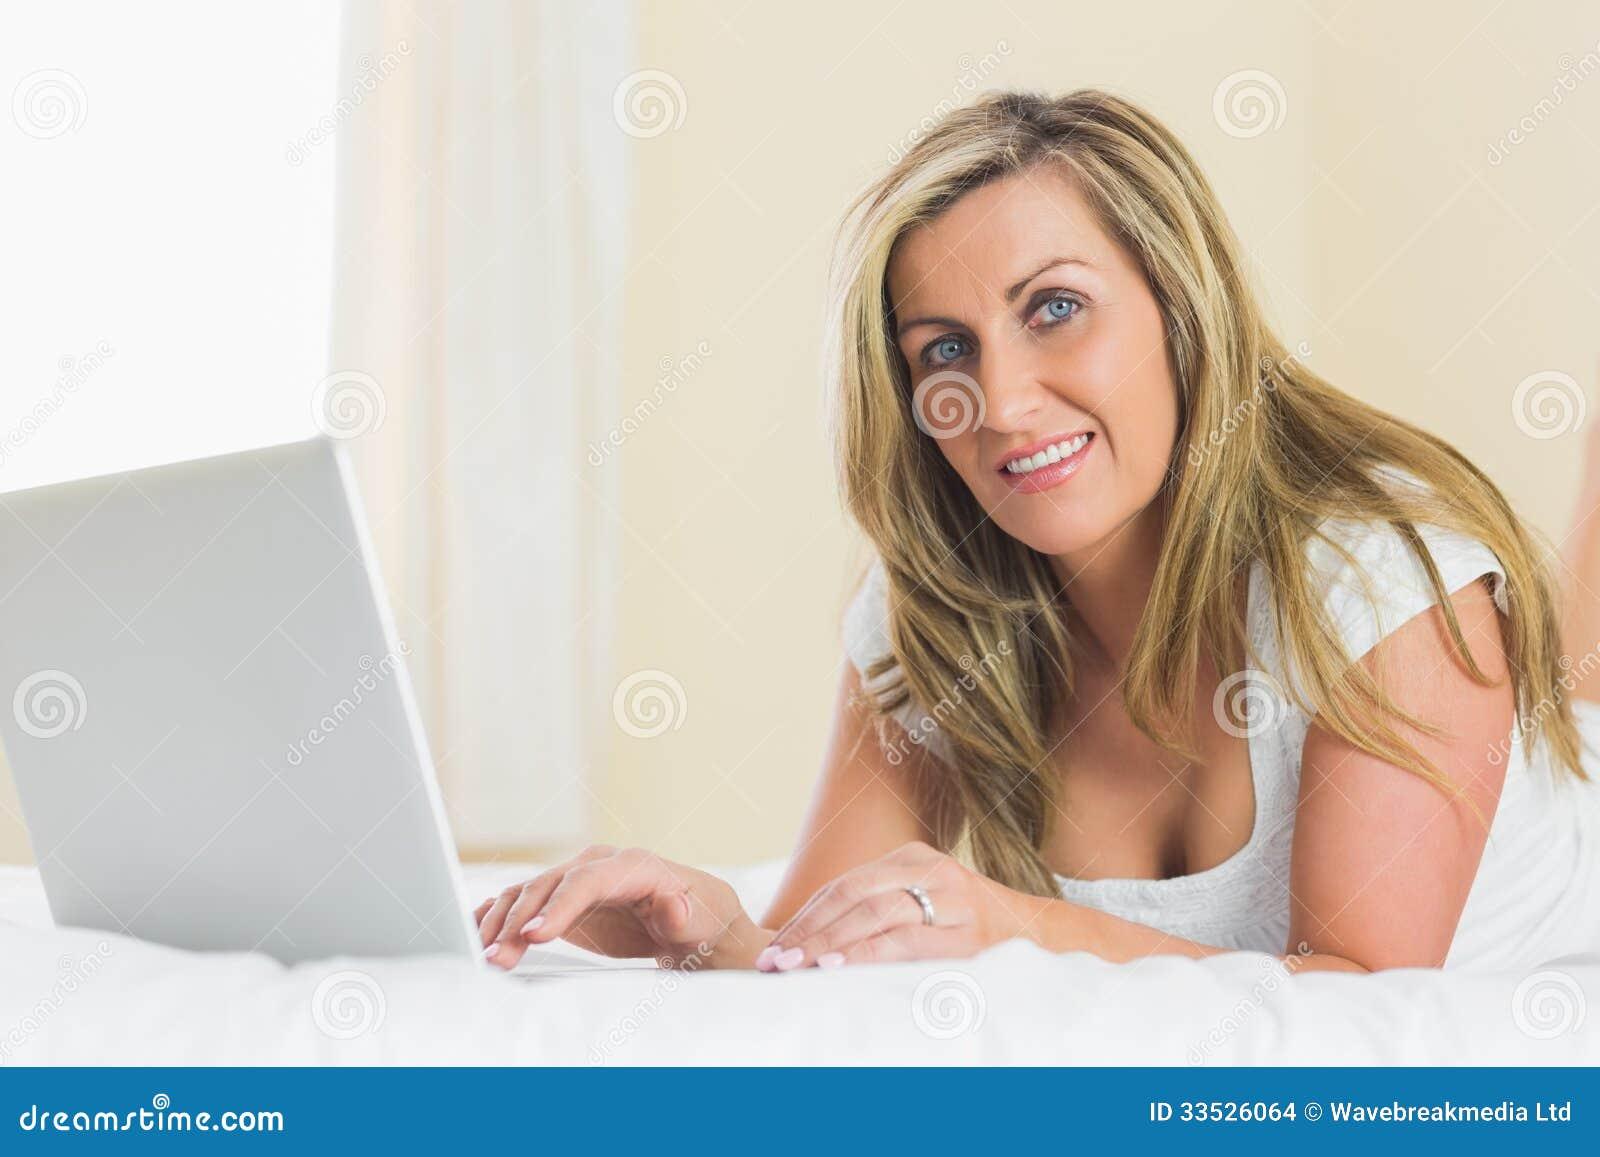 Adult lesbian older sex woman